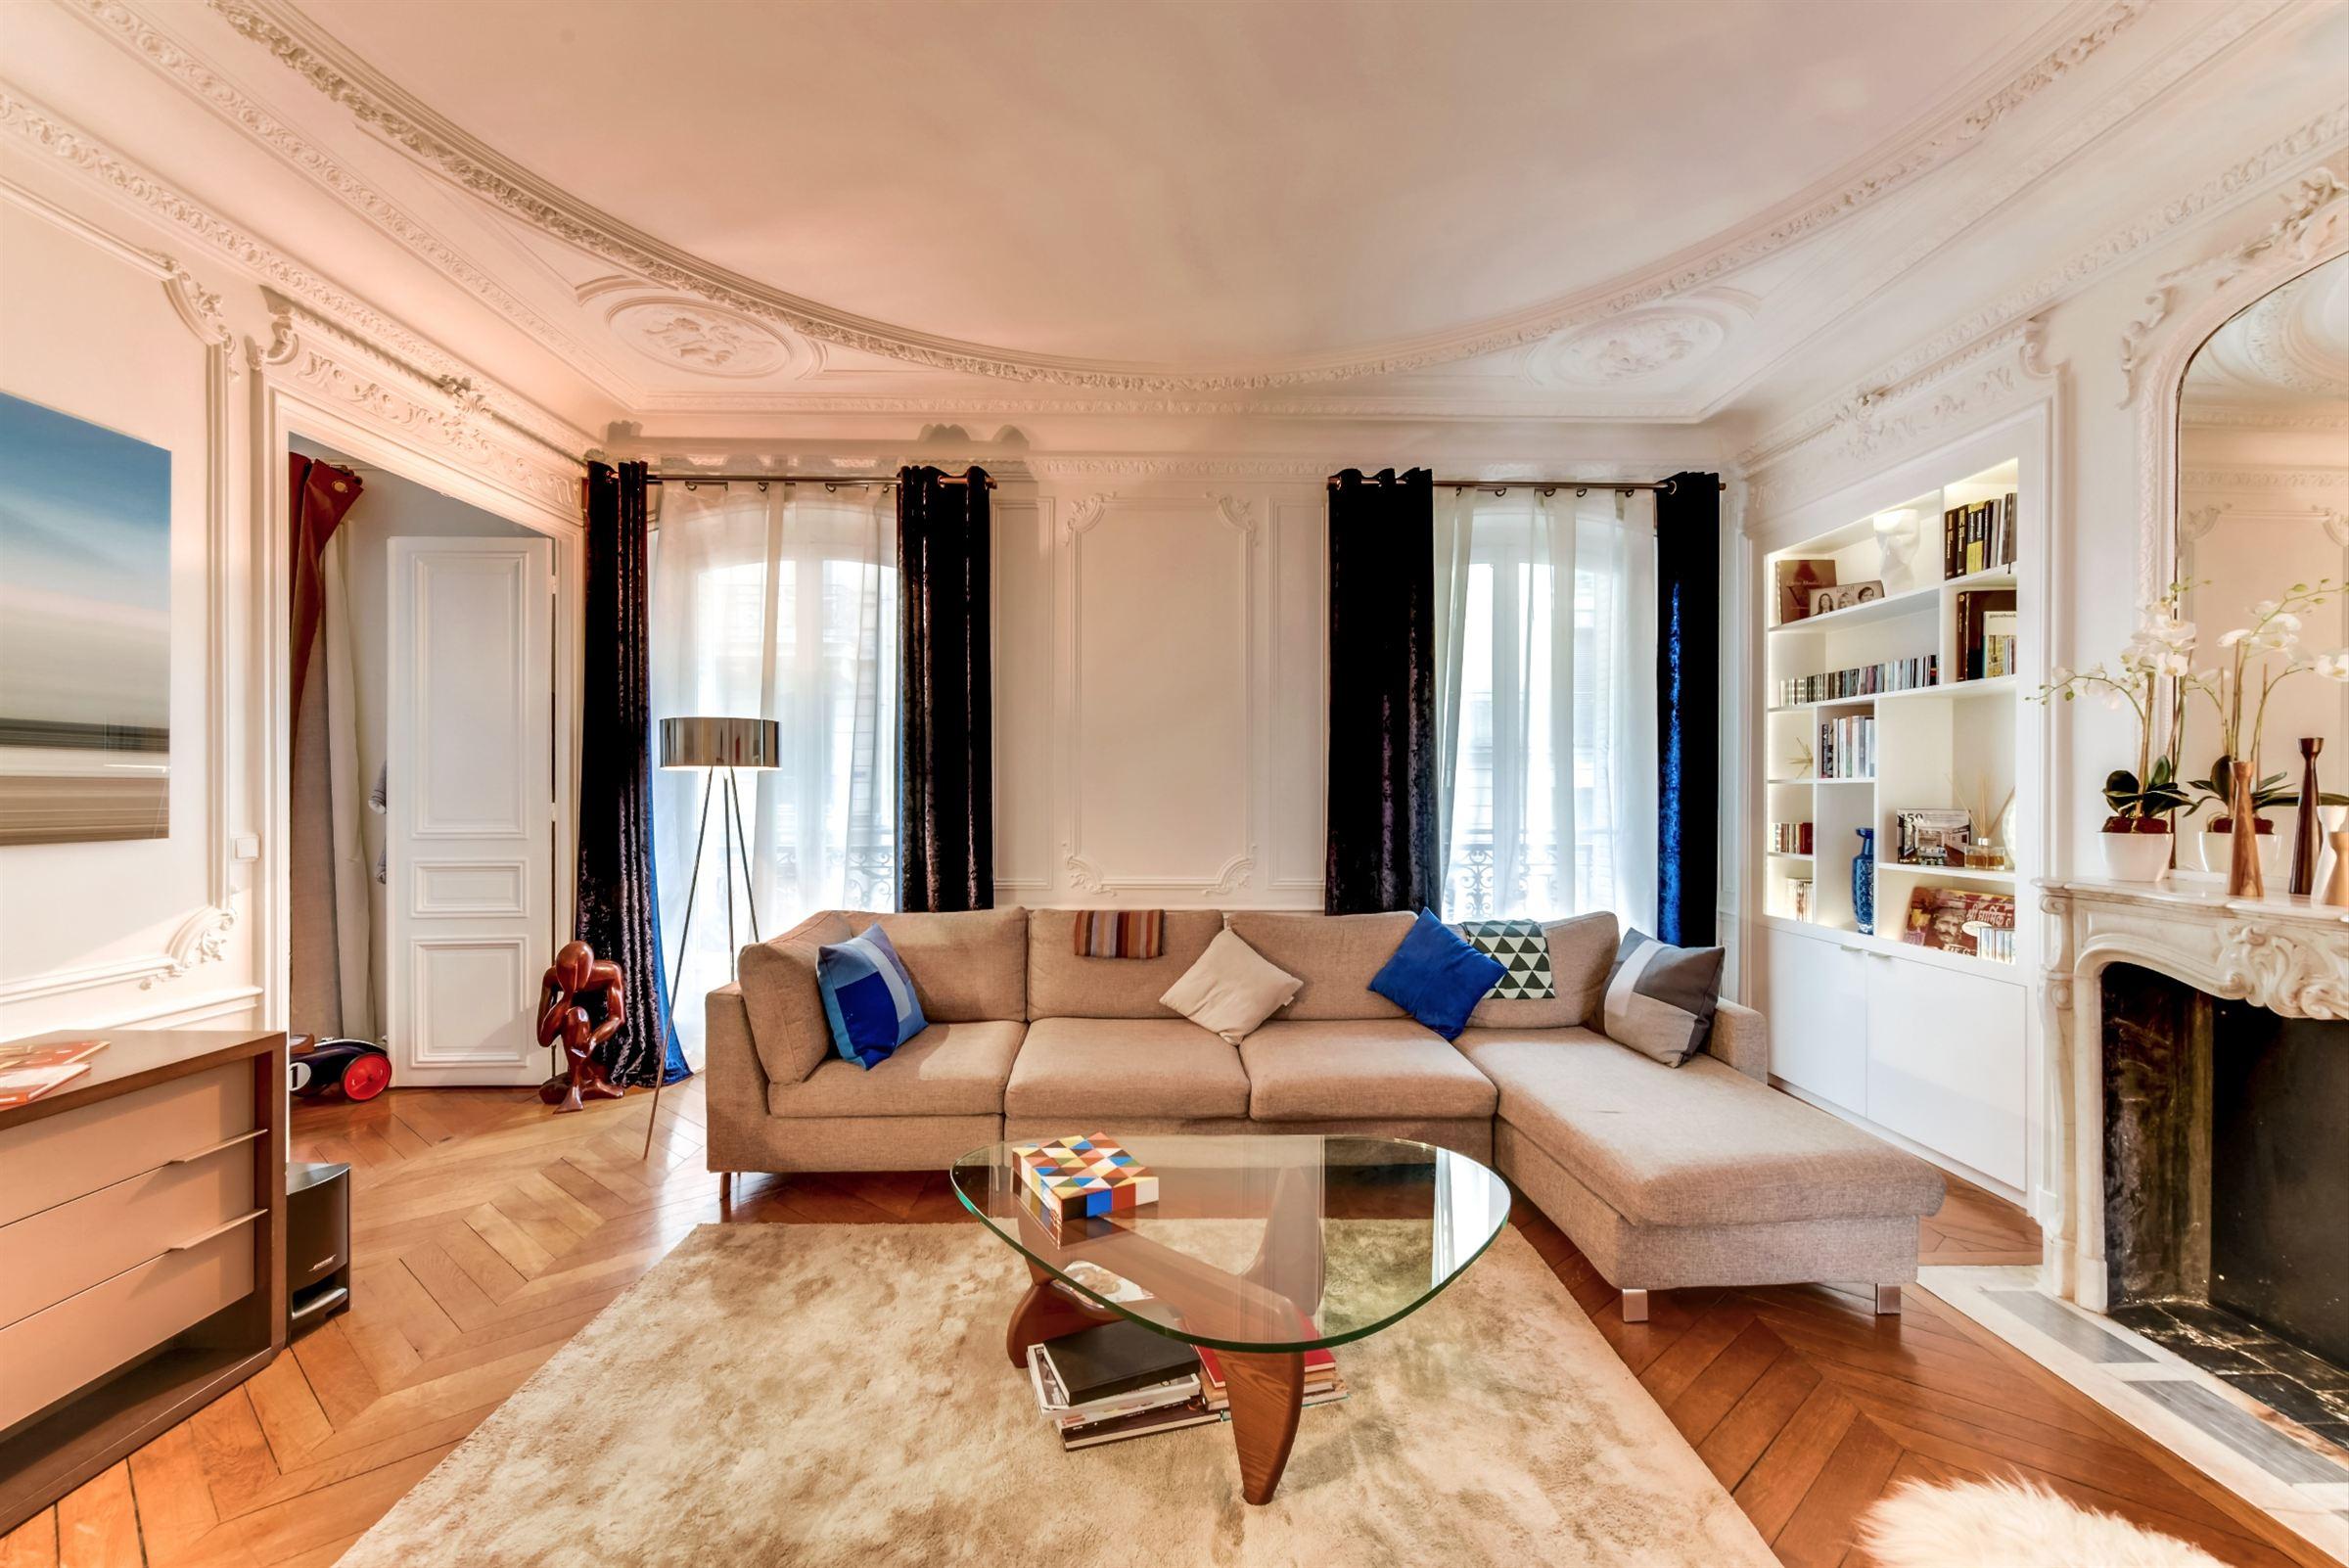 sales property at On sale sole agent in Paris 16 - Kléber - Trocadéro